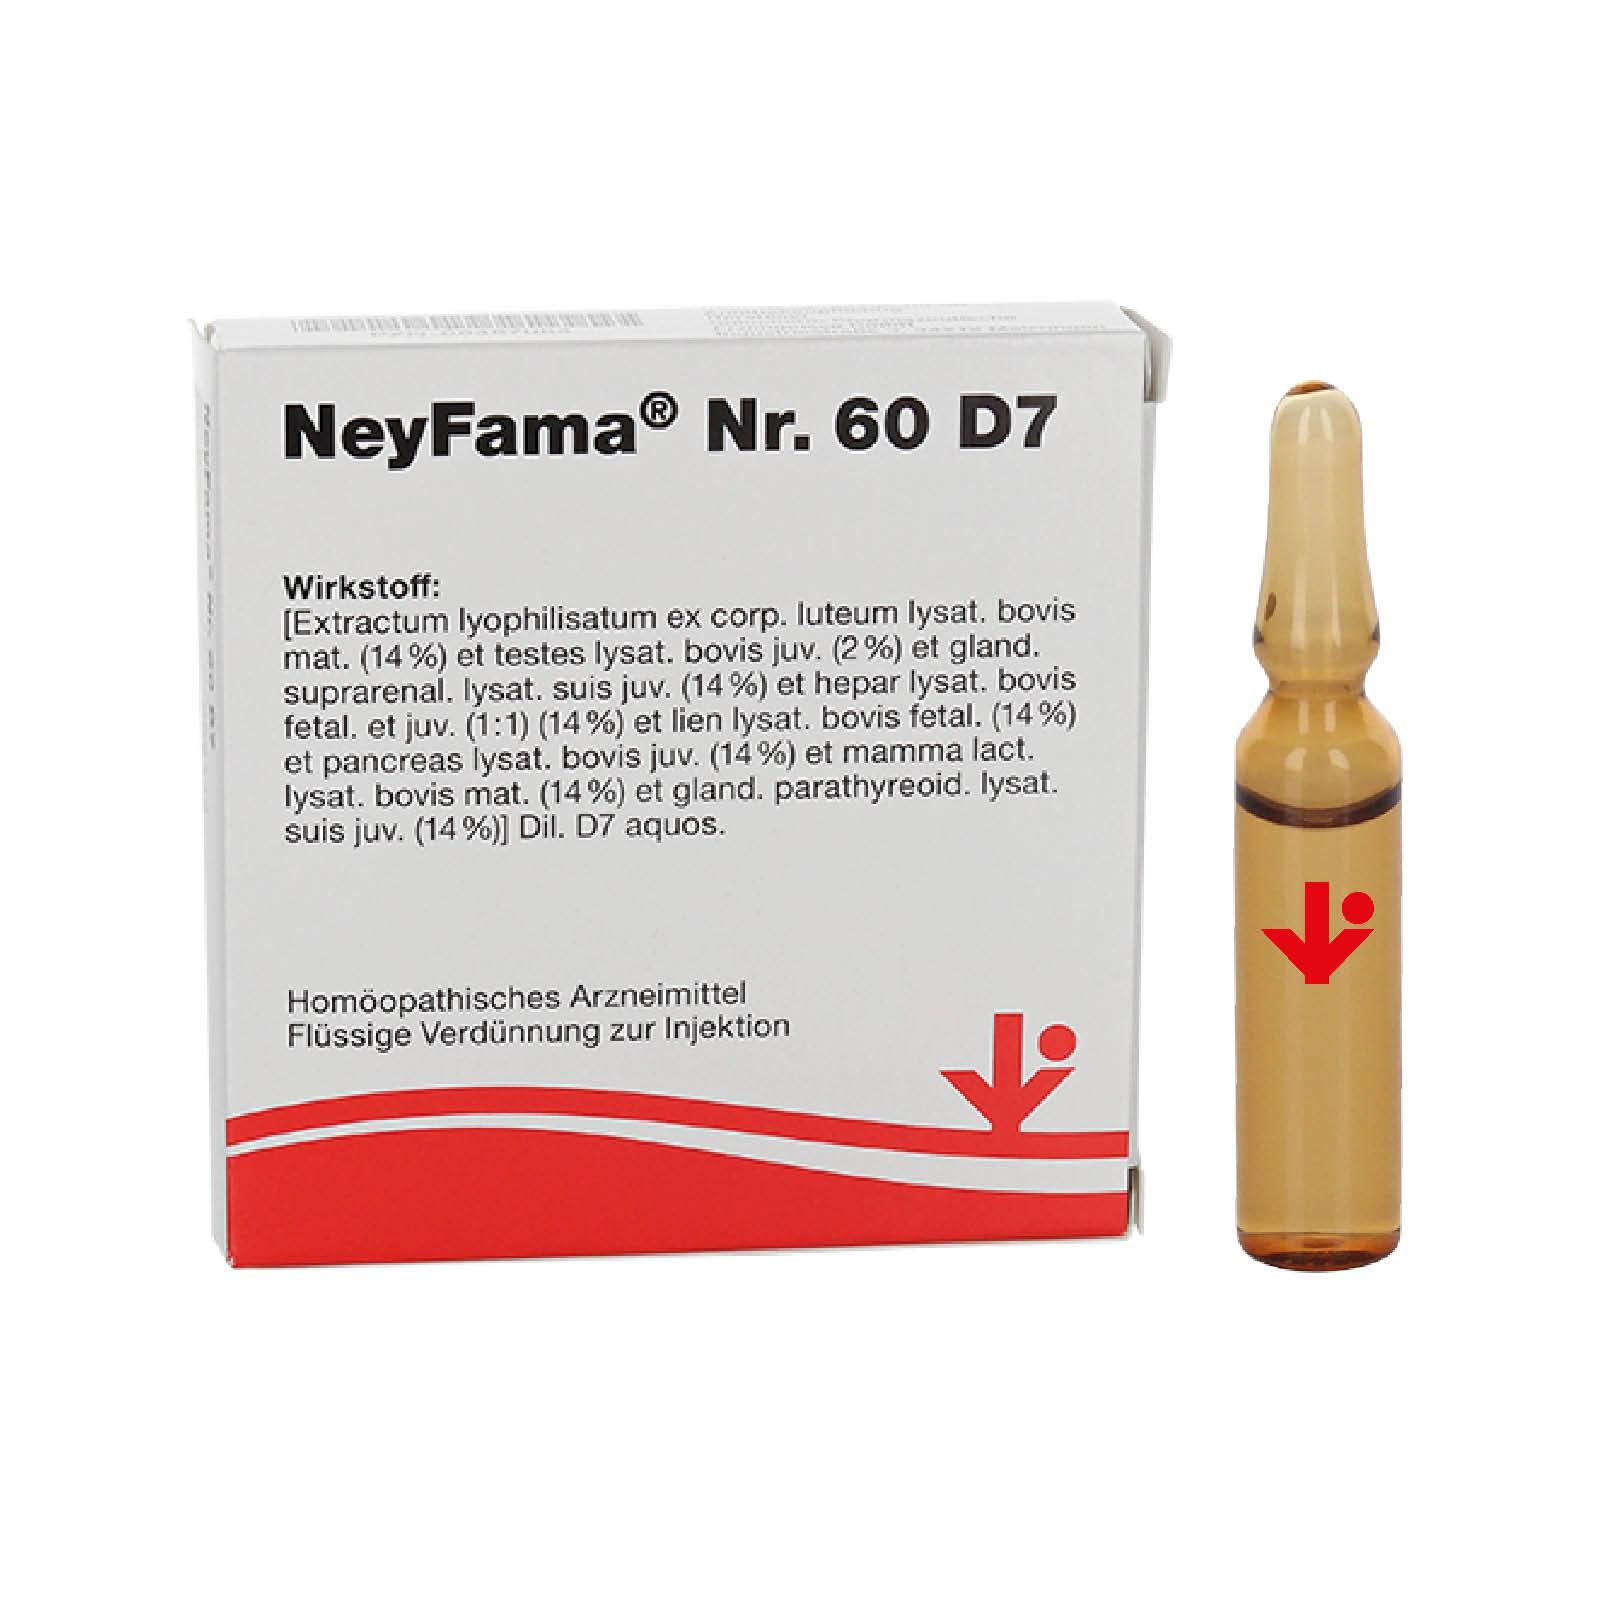 NeyFama® Nr. 60 D7 (früher NeyFam® genannt)